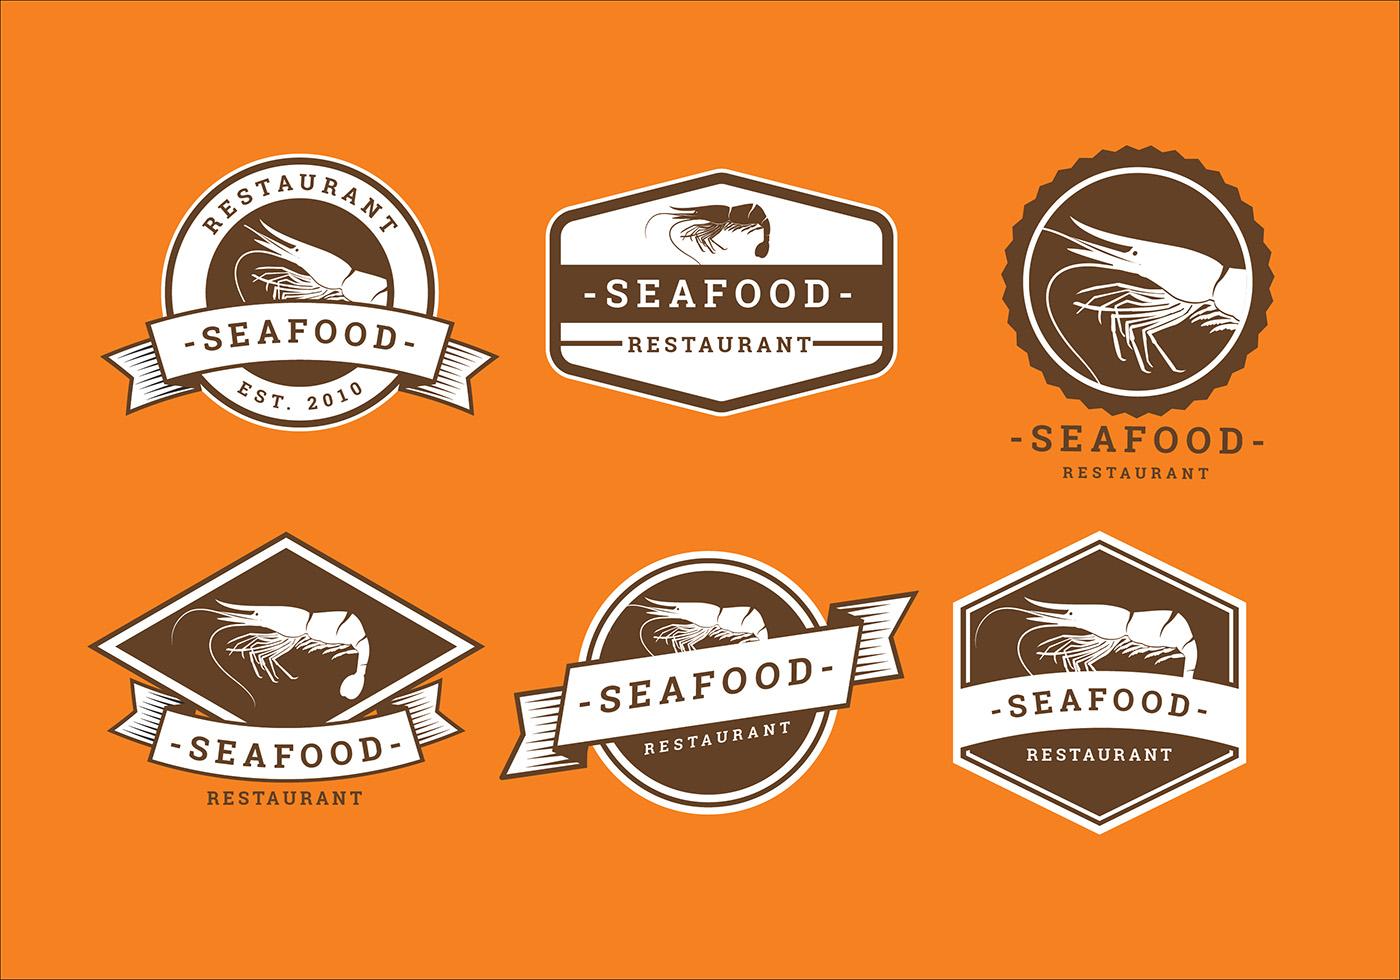 Prawn seafood restaurant logo vector download free